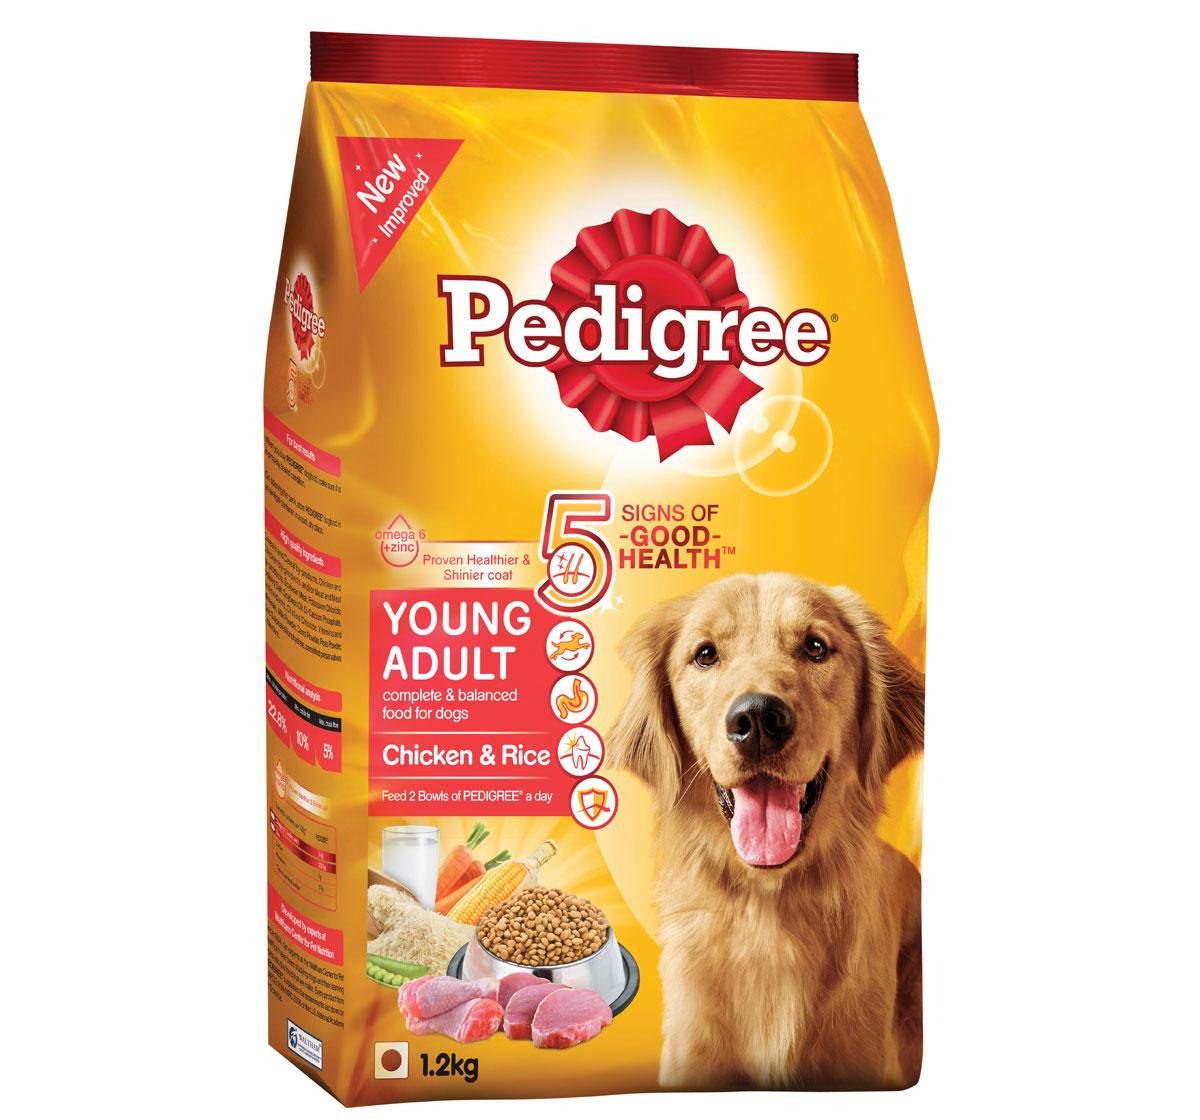 Pedigree dog food coupons canada 2018